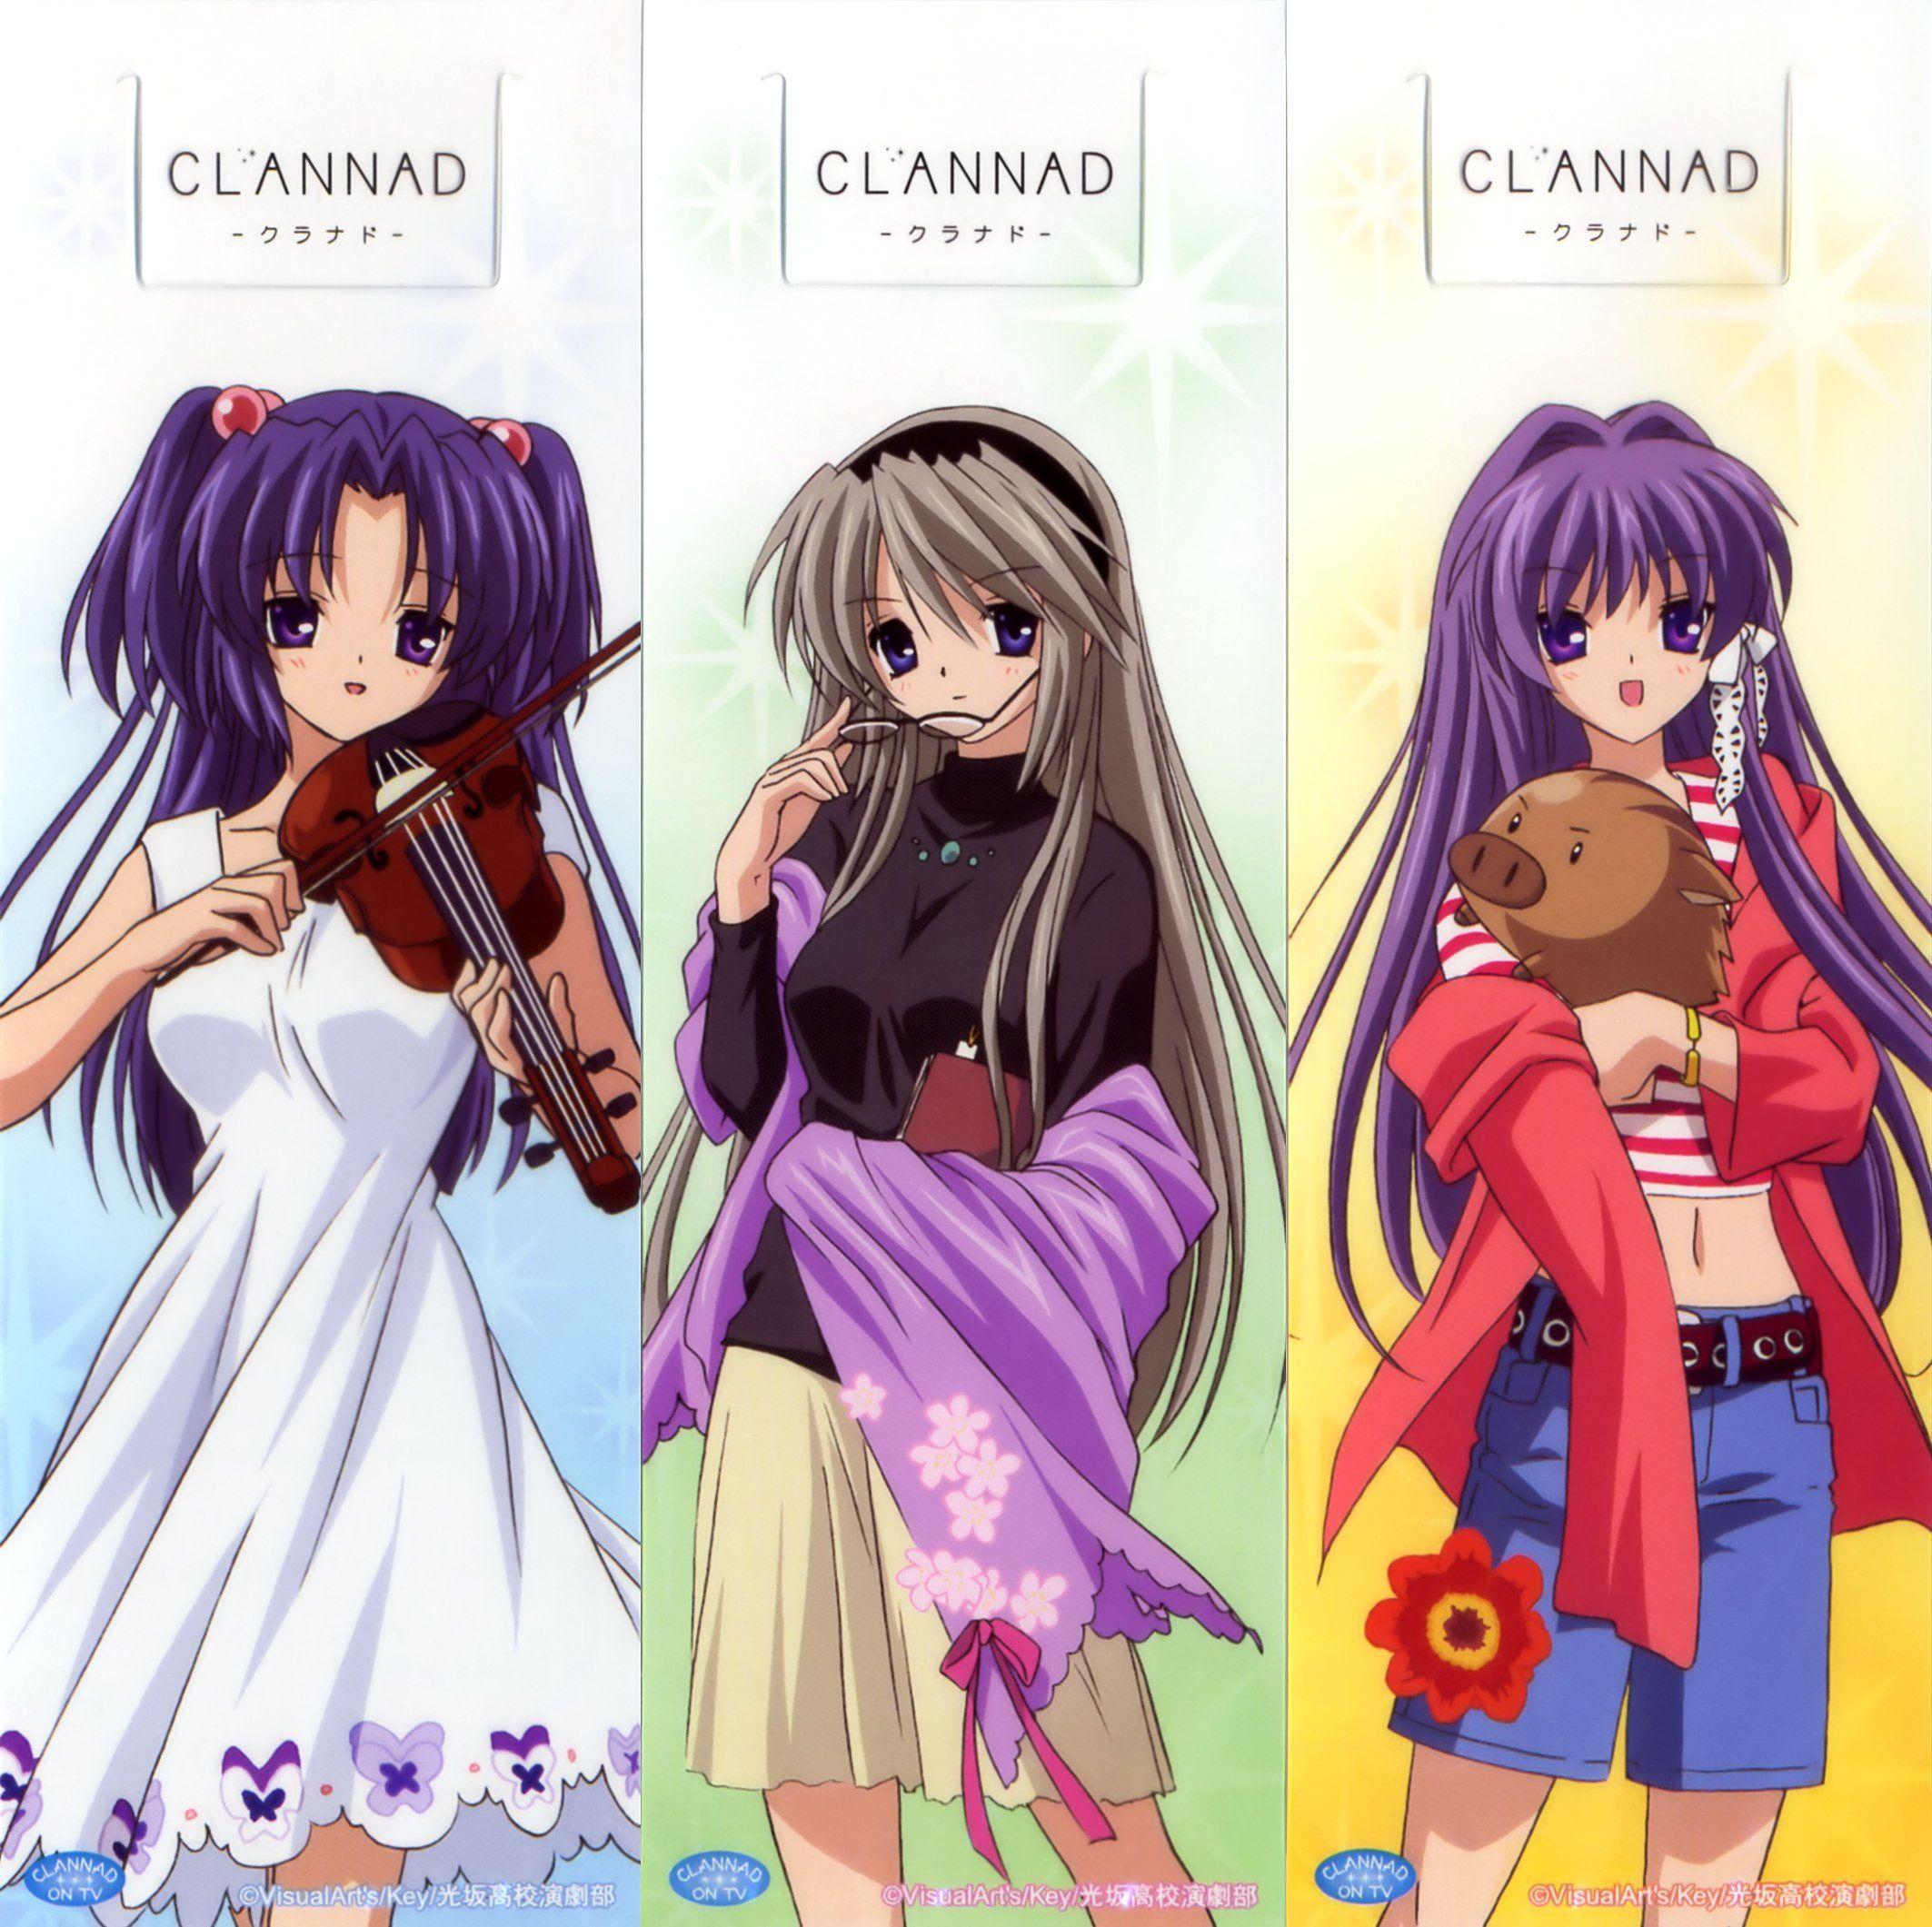 Clannad 213482 Clannad Anime Clannad Clannad After Story